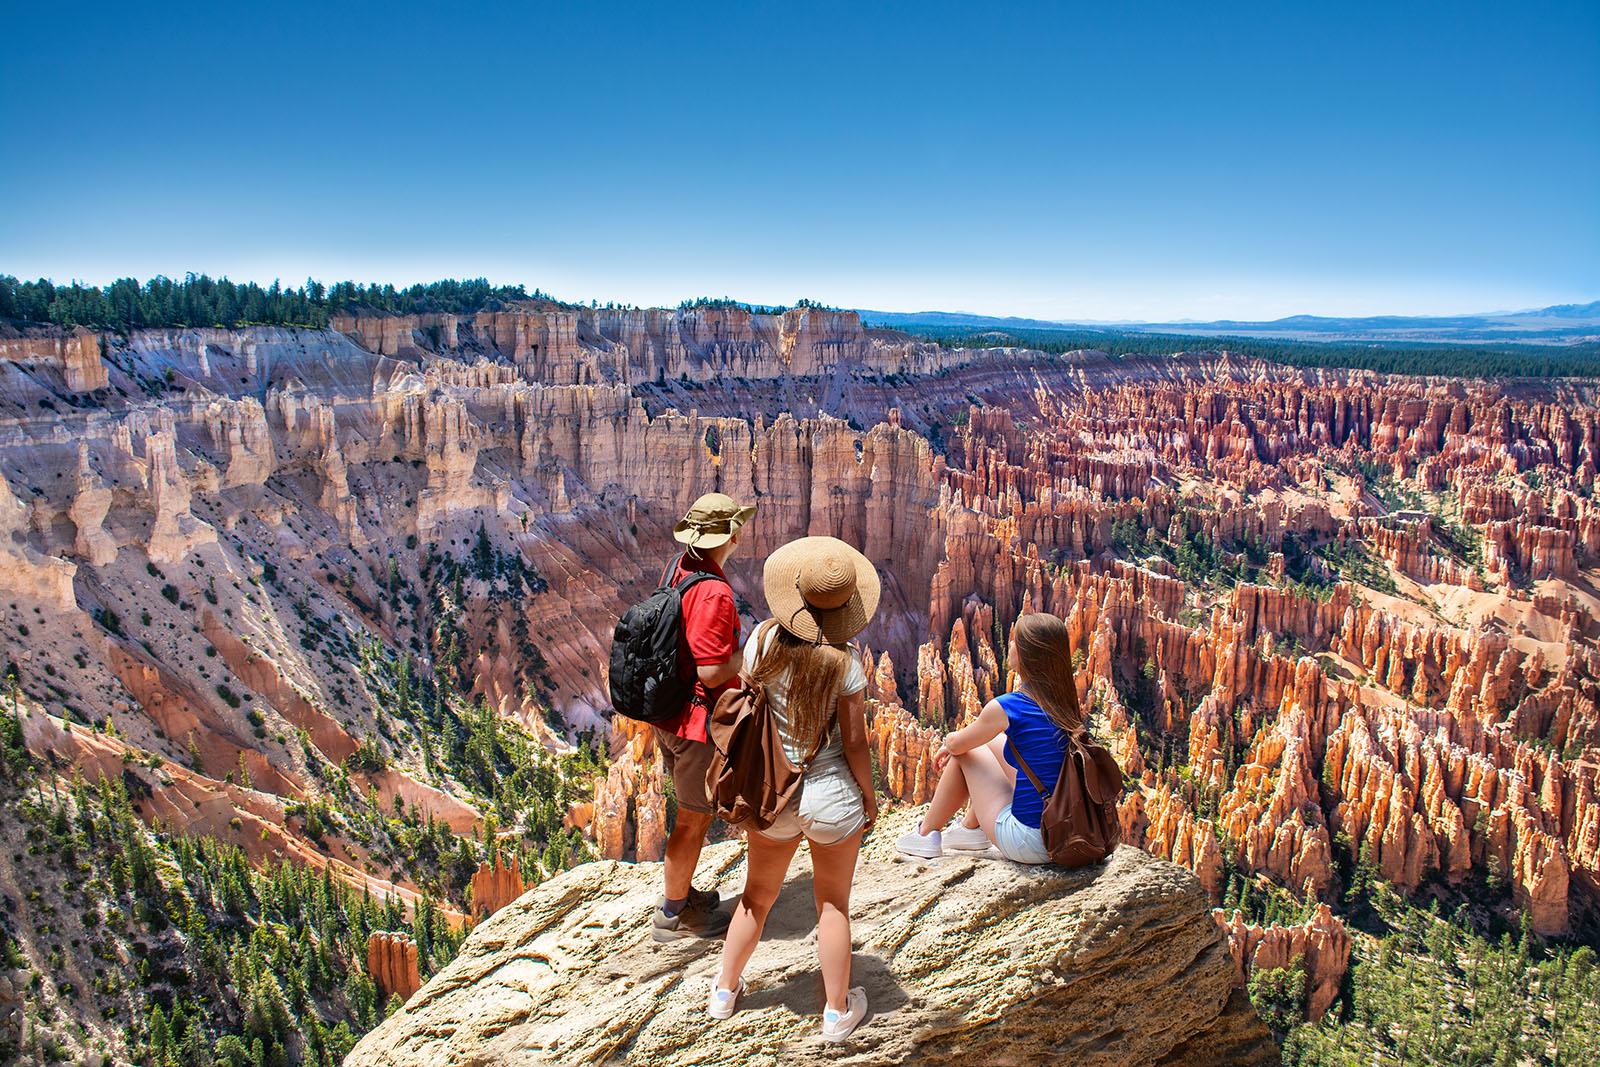 people on hiking trip